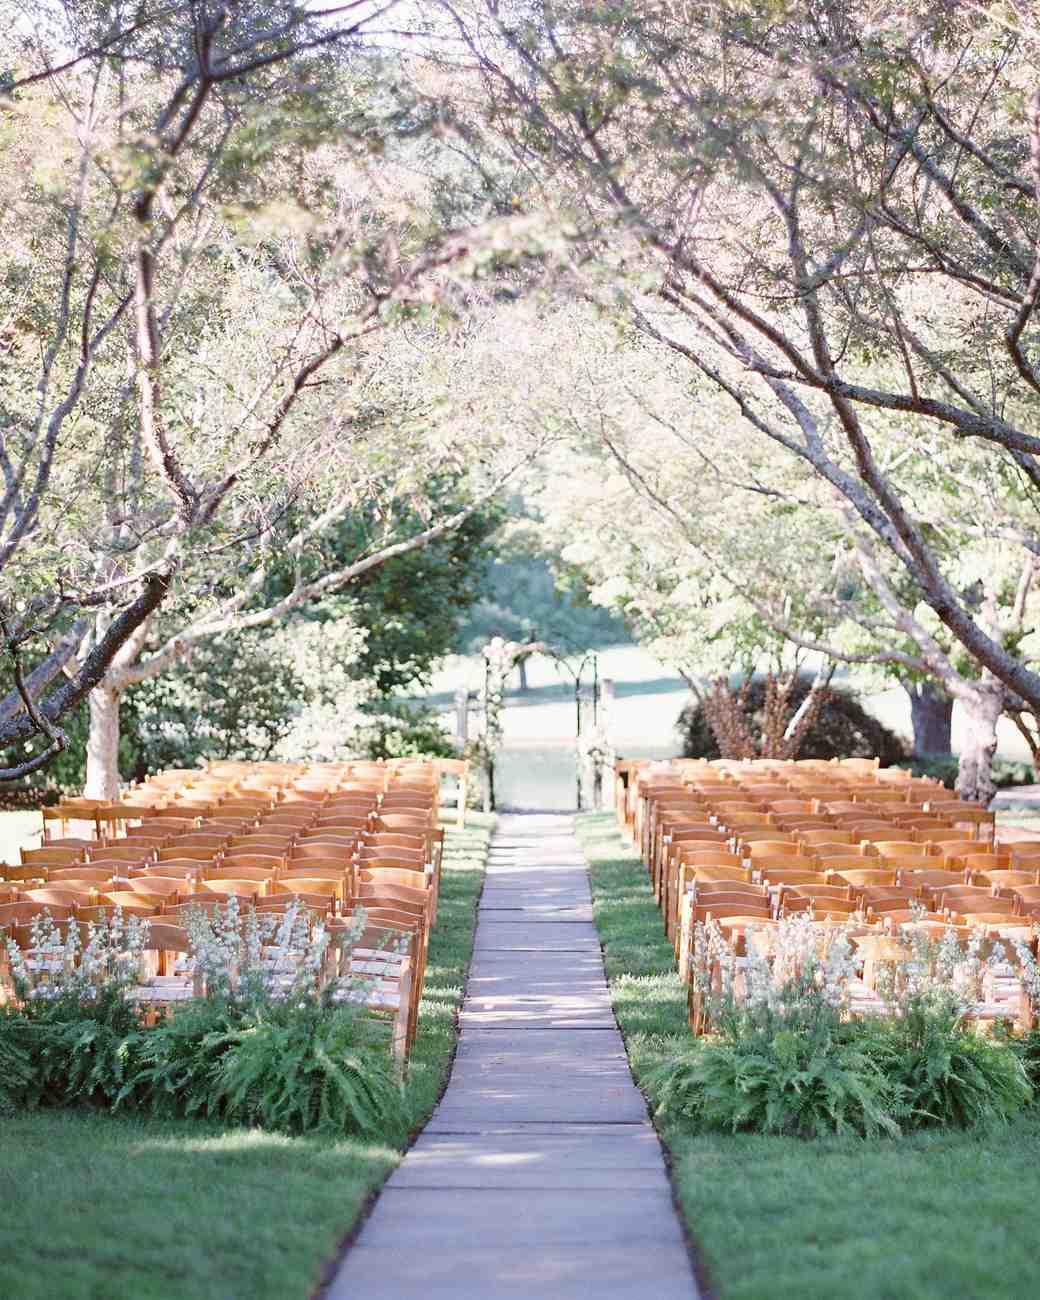 amy-garrison-wedding-ceremony-00414-6134266-0816.jpg